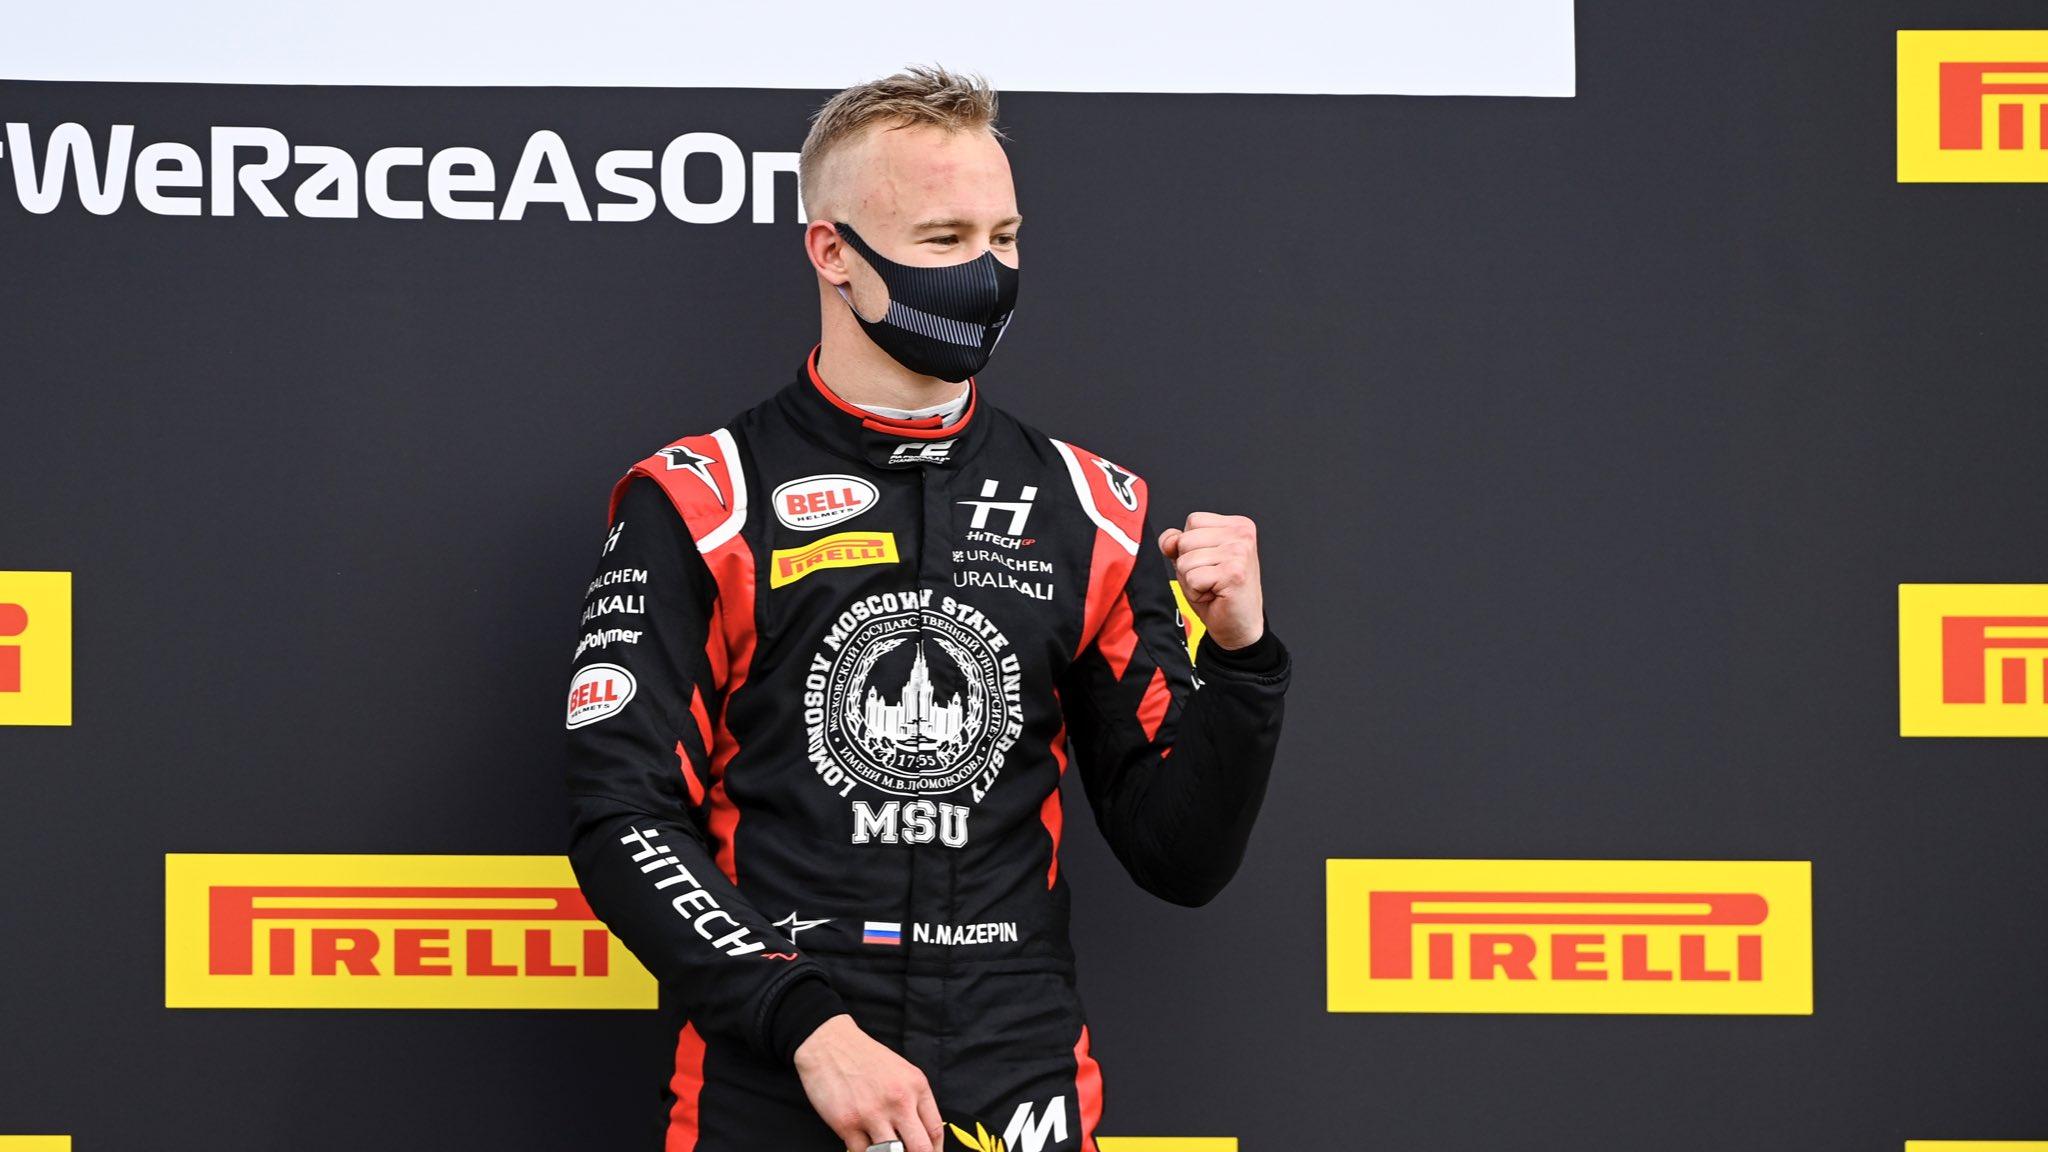 Haas annonce Nikita Mazepin pour 2021